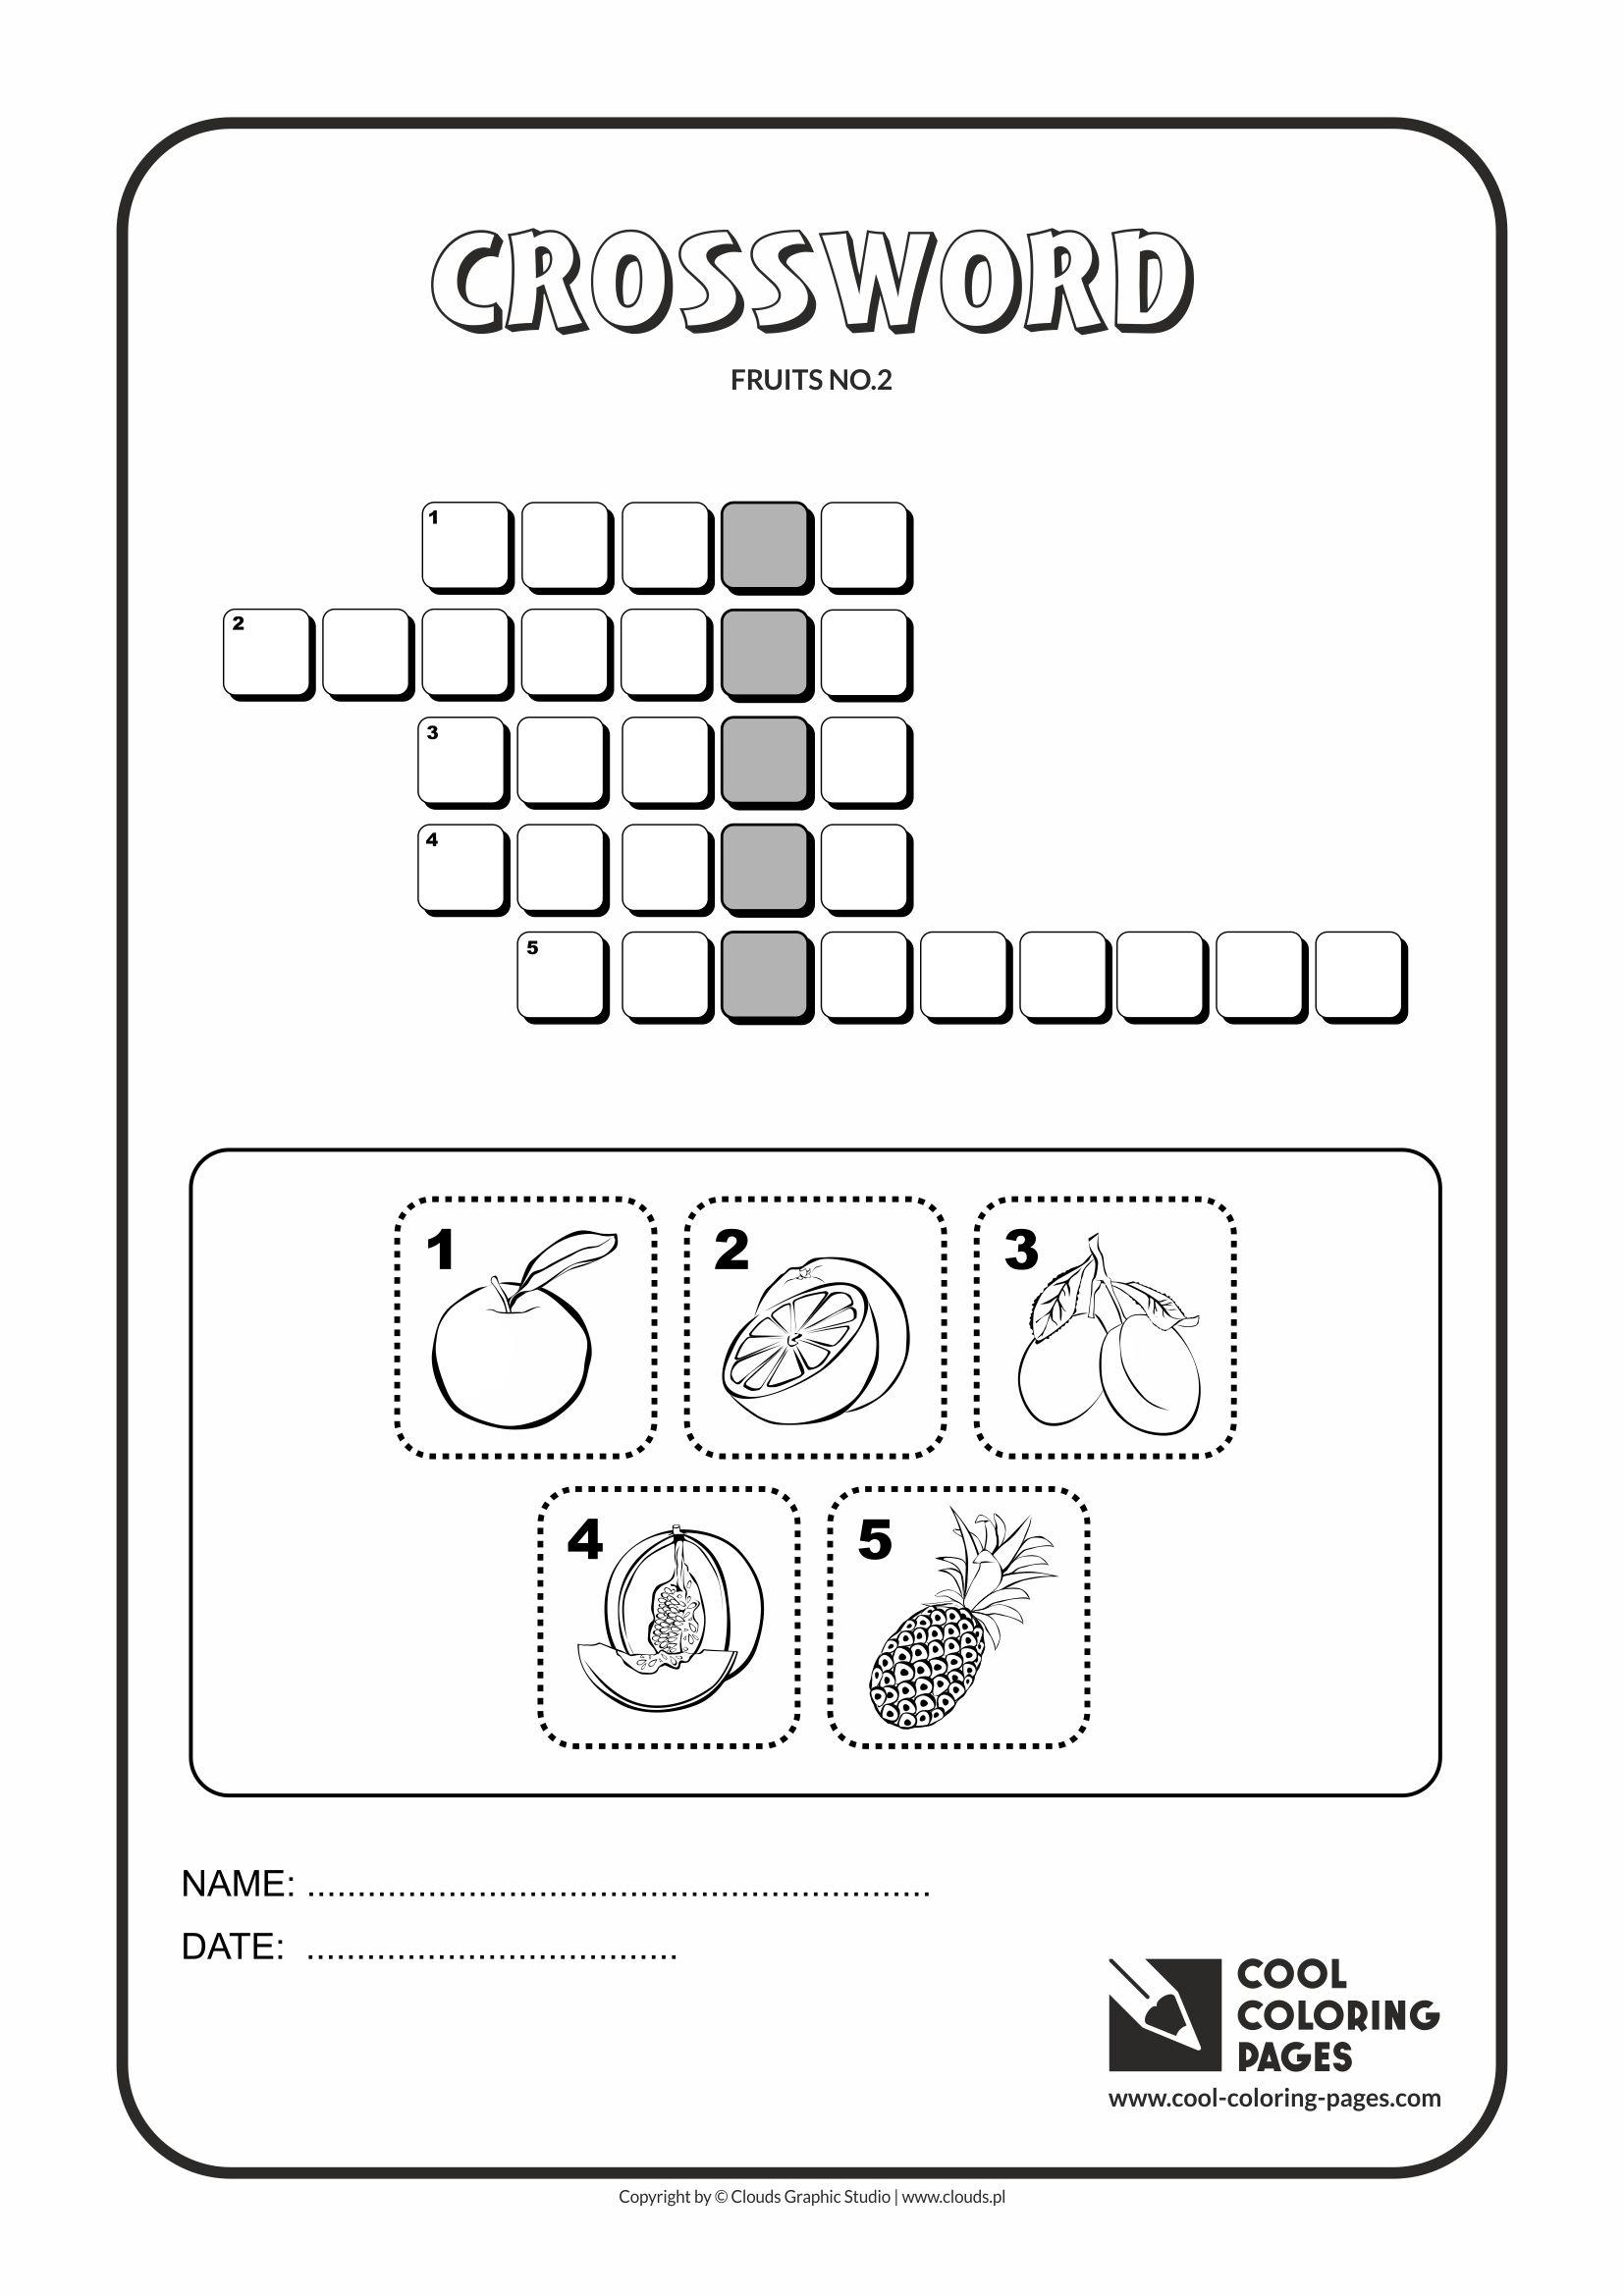 Crossword For Kids Fruits